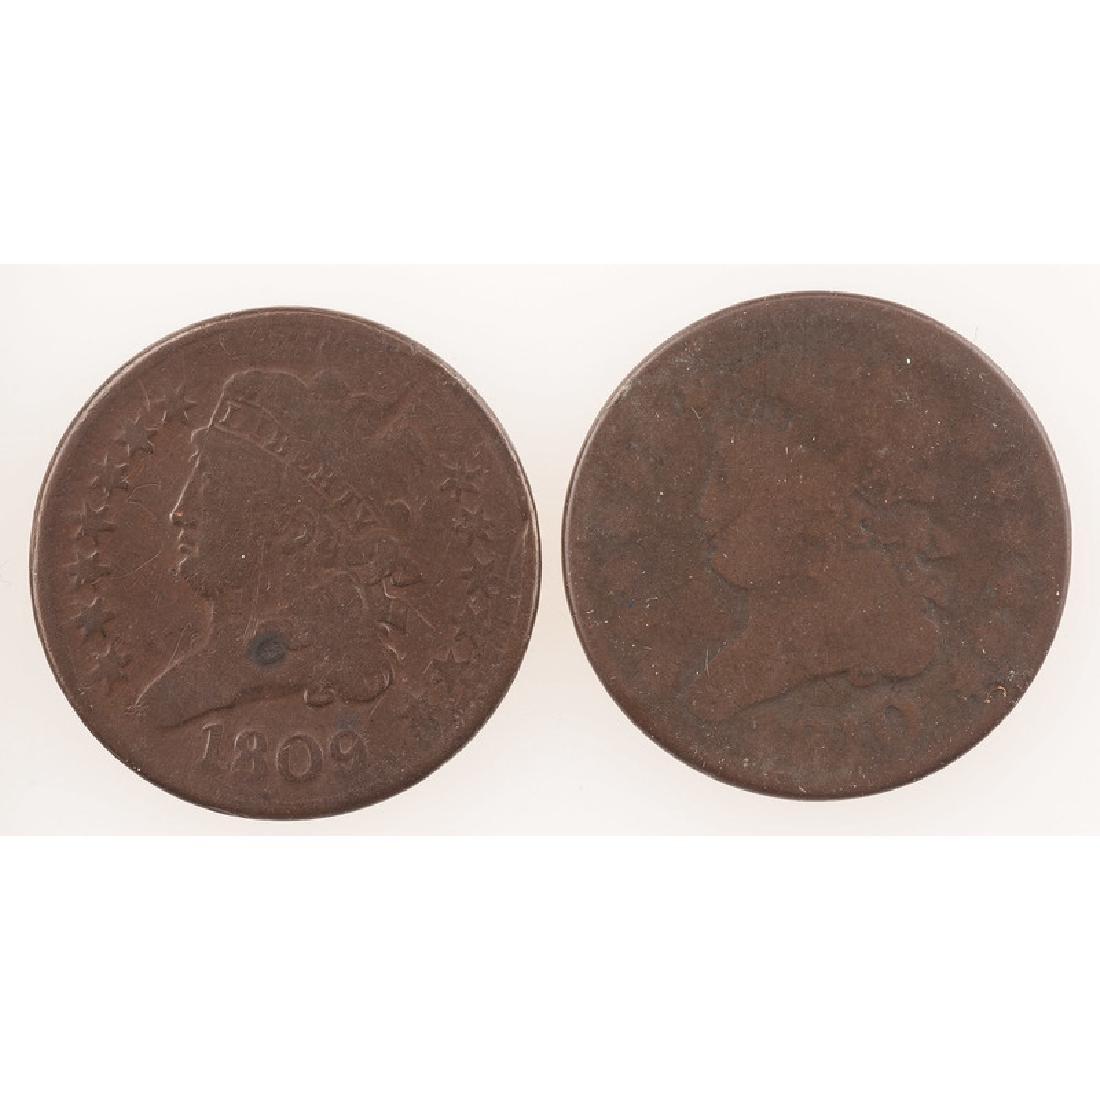 United States Half Cents 1809-1810